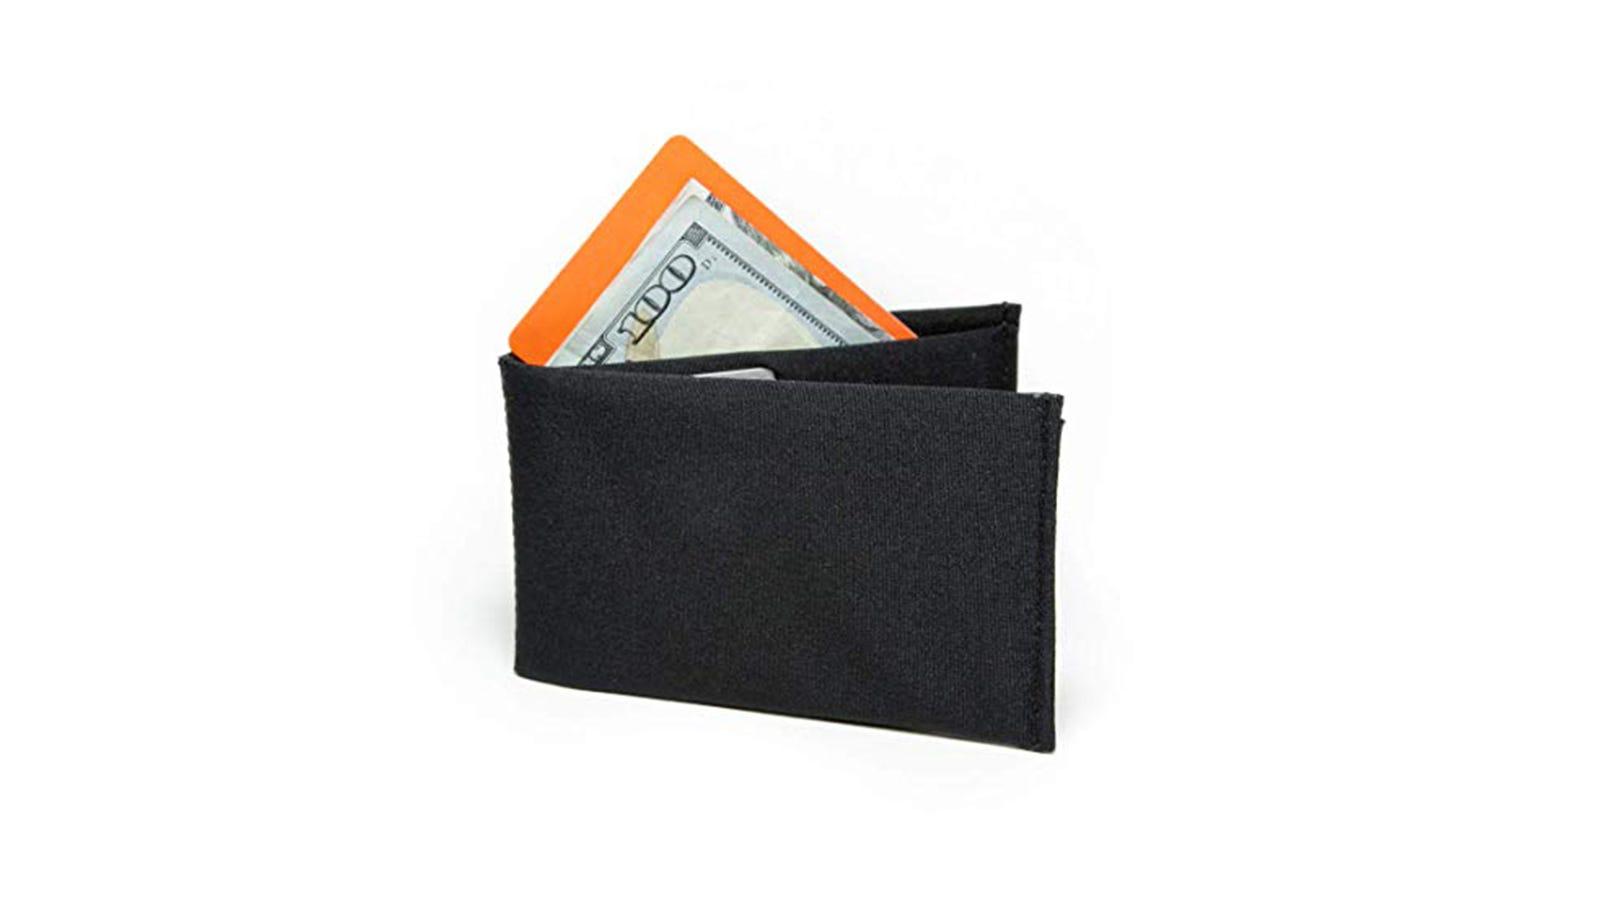 SlimFold Minimalist Wallet - RFID Option - Thin, Durable, and Waterproof Guaranteed - Made in USA - Nano Size